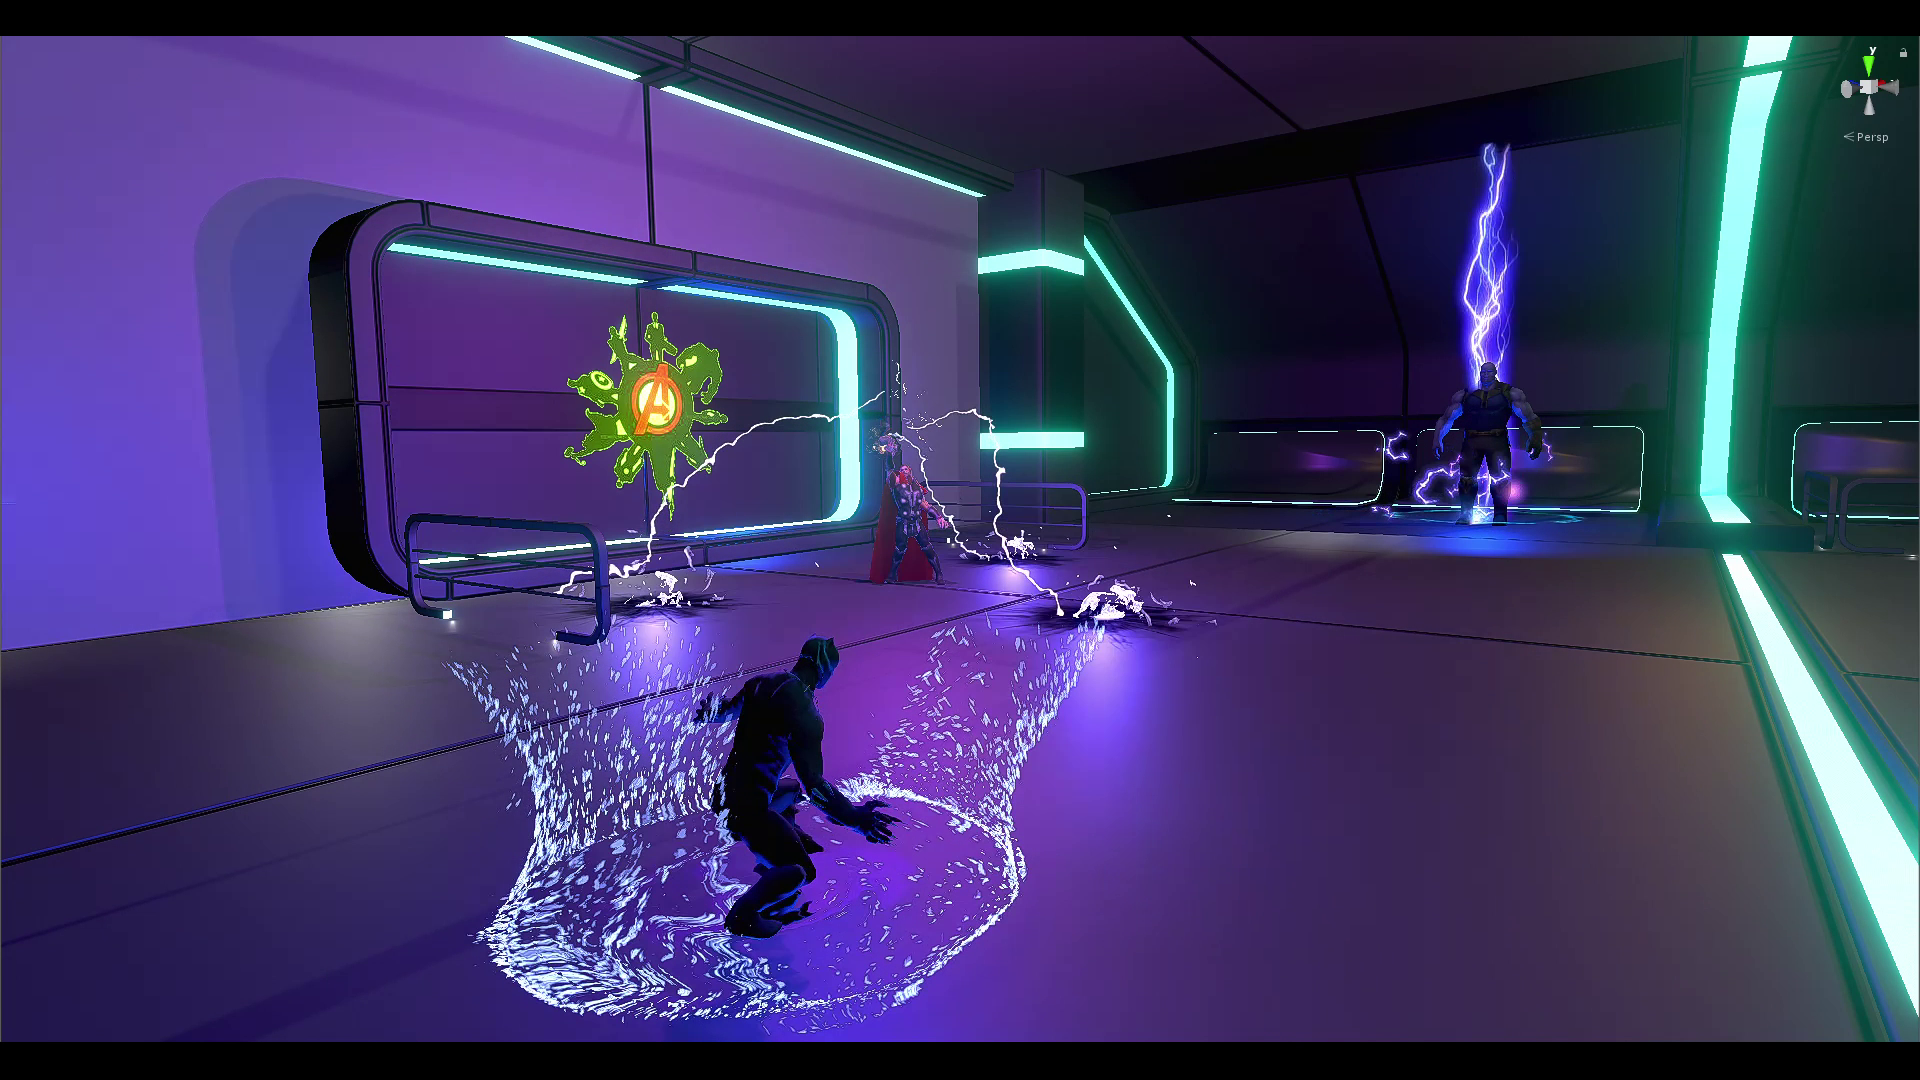 Marvel Cinematic Universe in VR